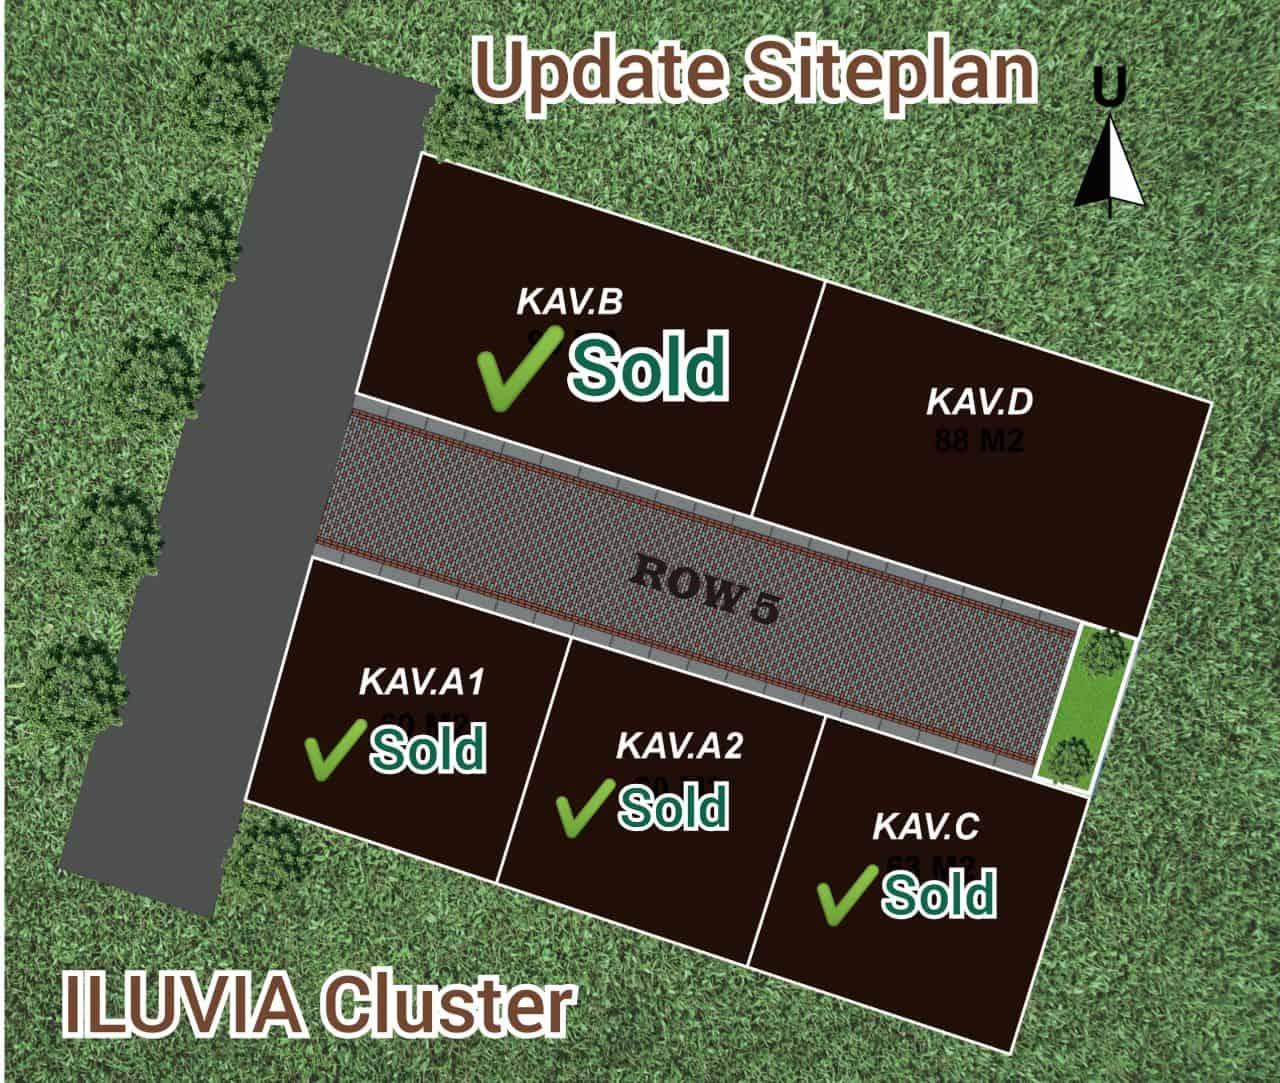 2021-03-28 Iluvia Cluster - Rumah Syariah Bandung Arcamanik - Update Siteplan